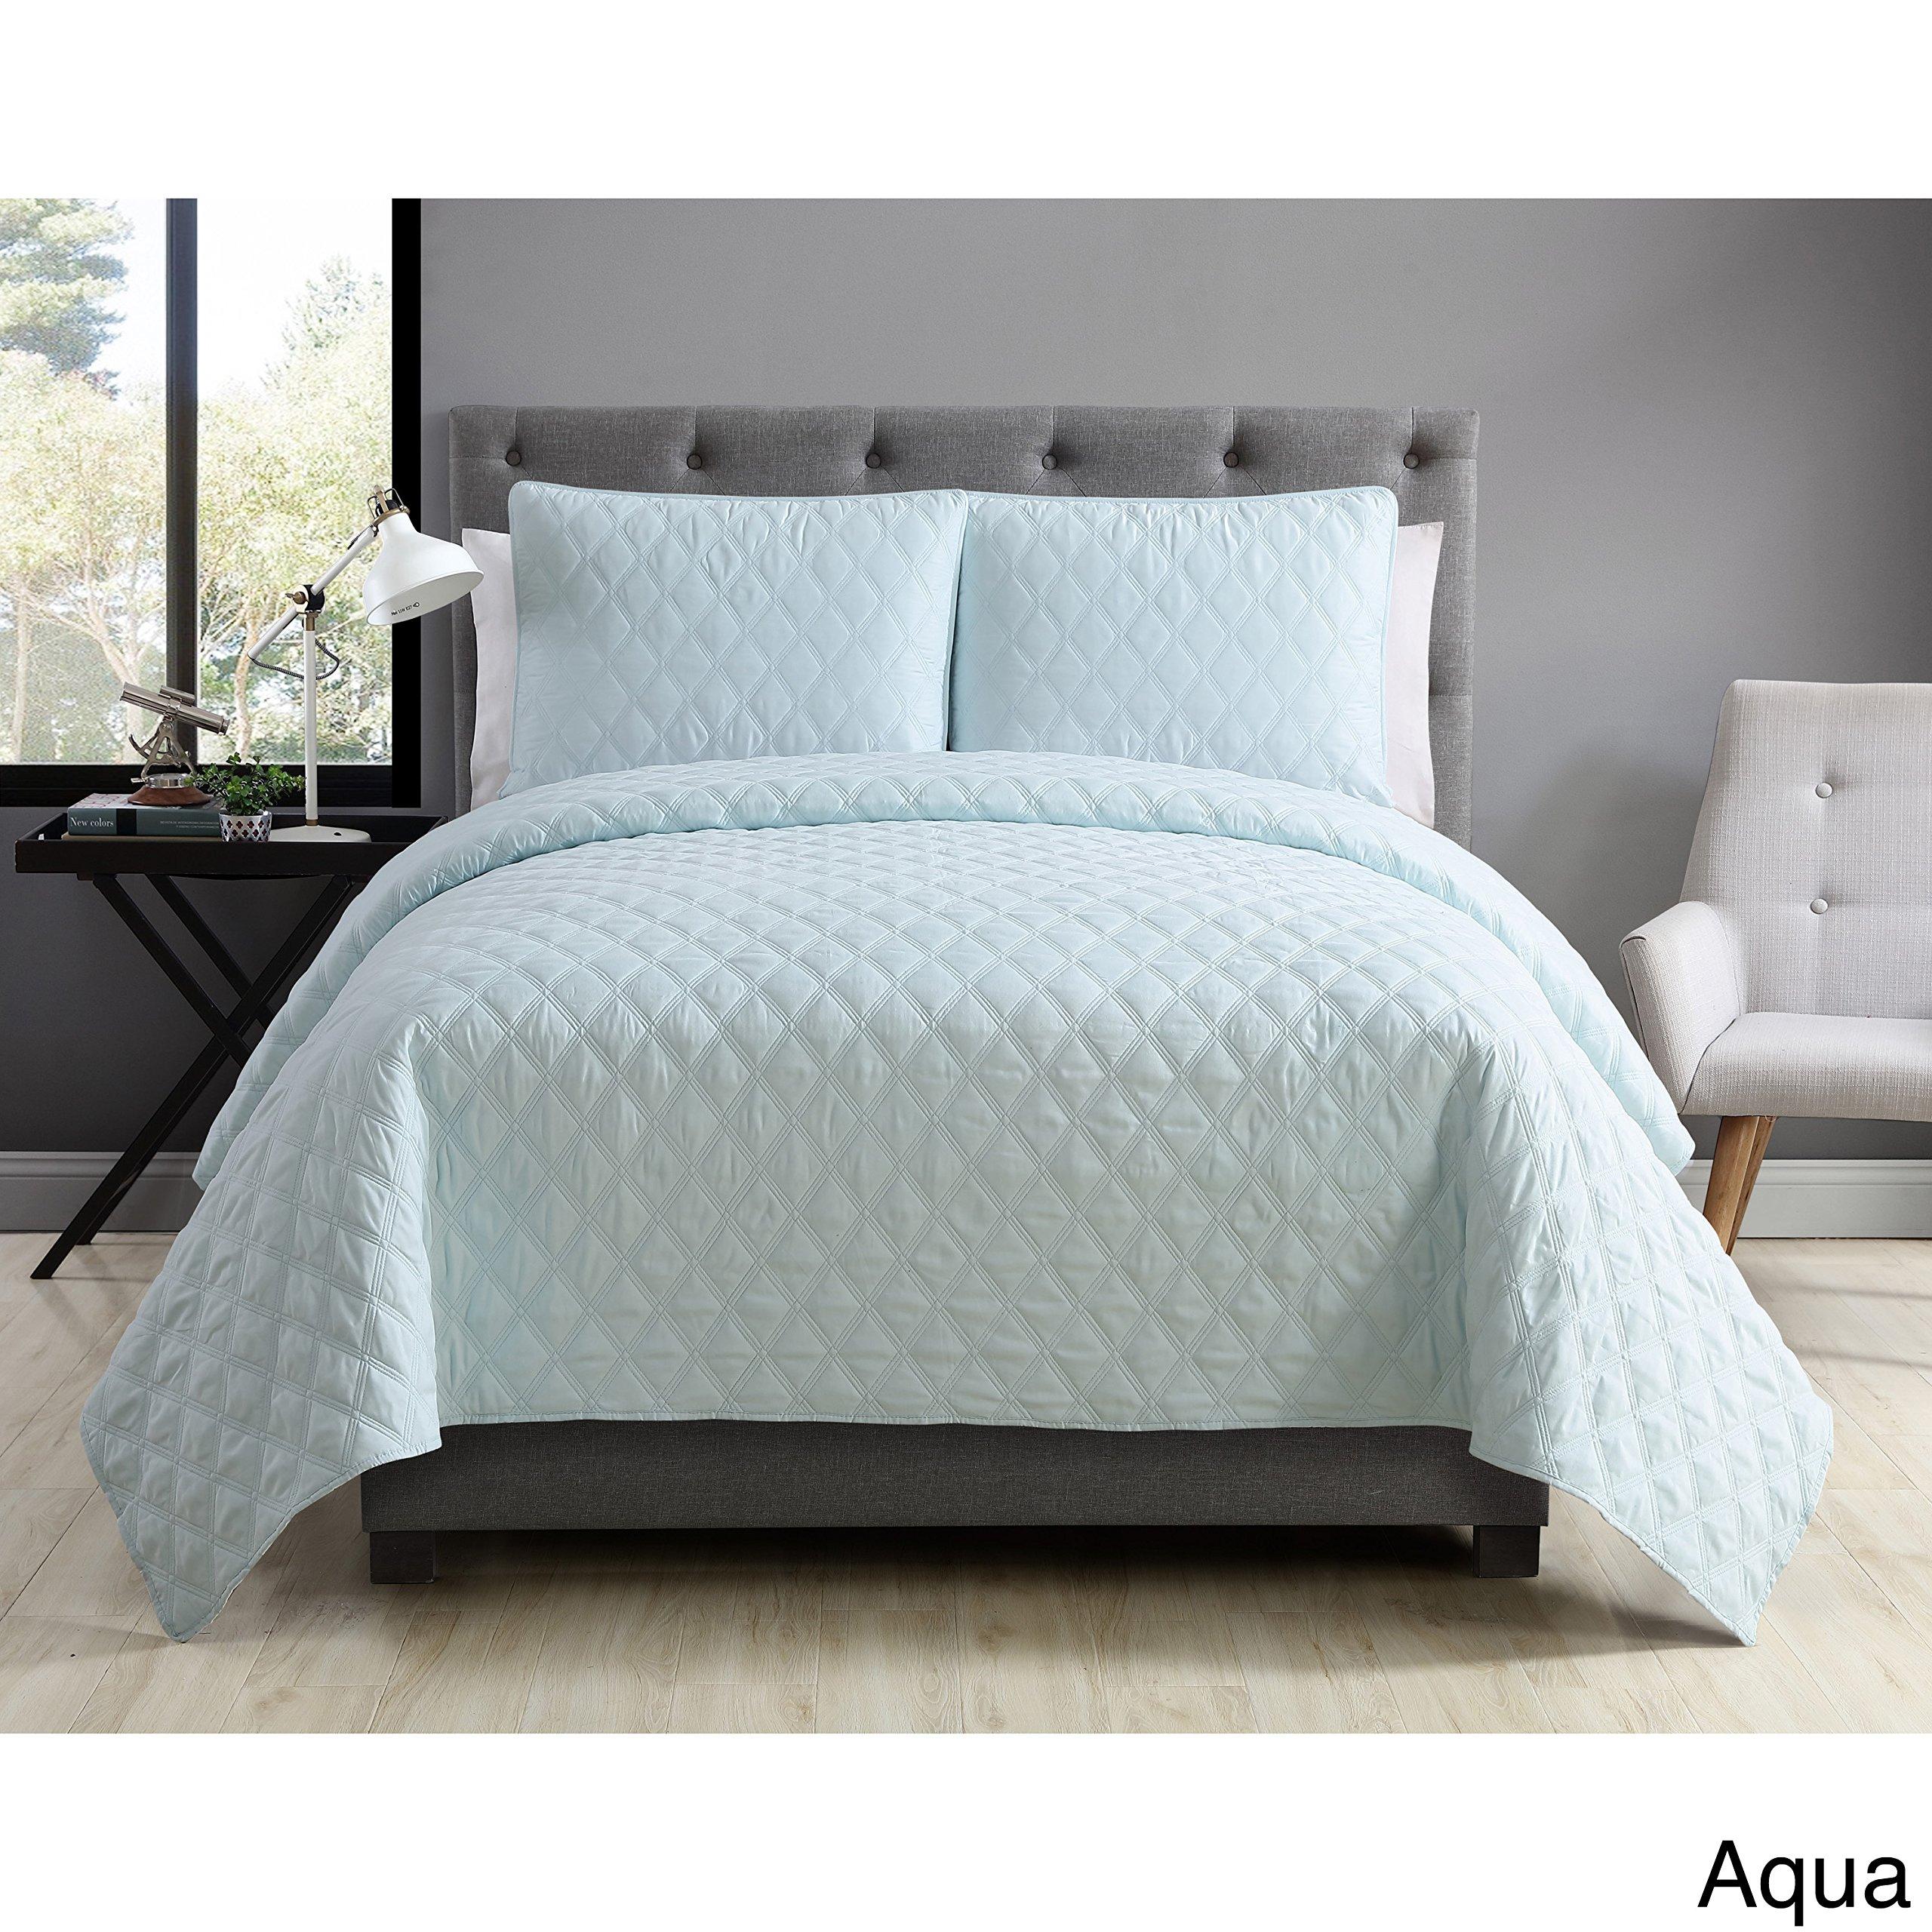 VCNY Home Buckingham Coverlet with 2 Pillow Shams Set, Full/Queen, Aqua